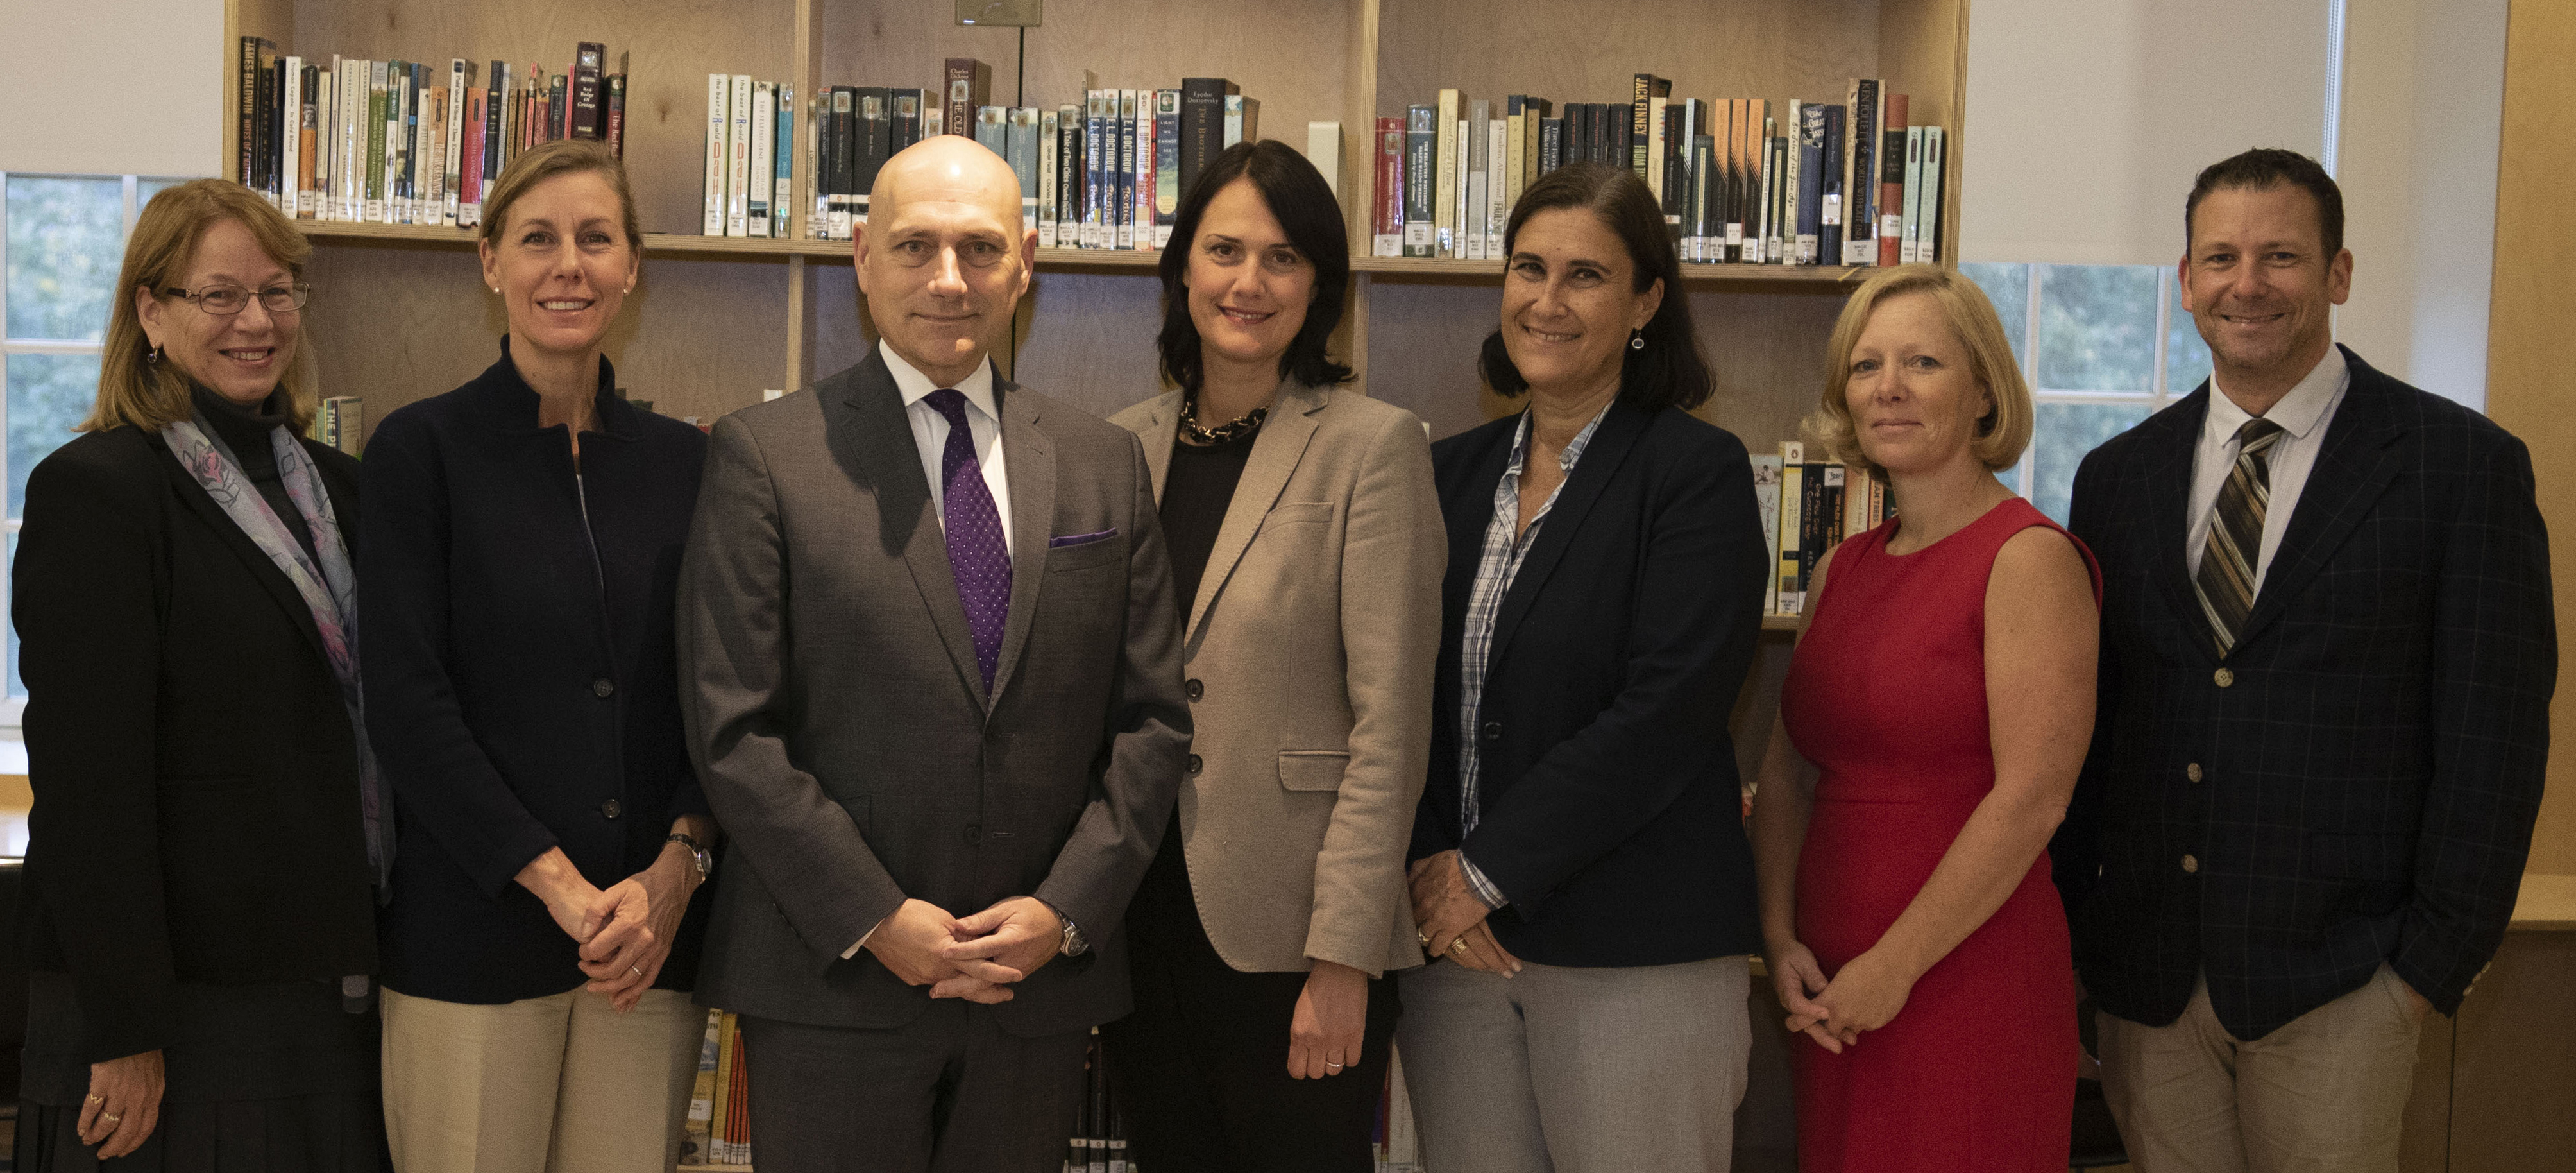 Senior Leadership Team - International School of Boston